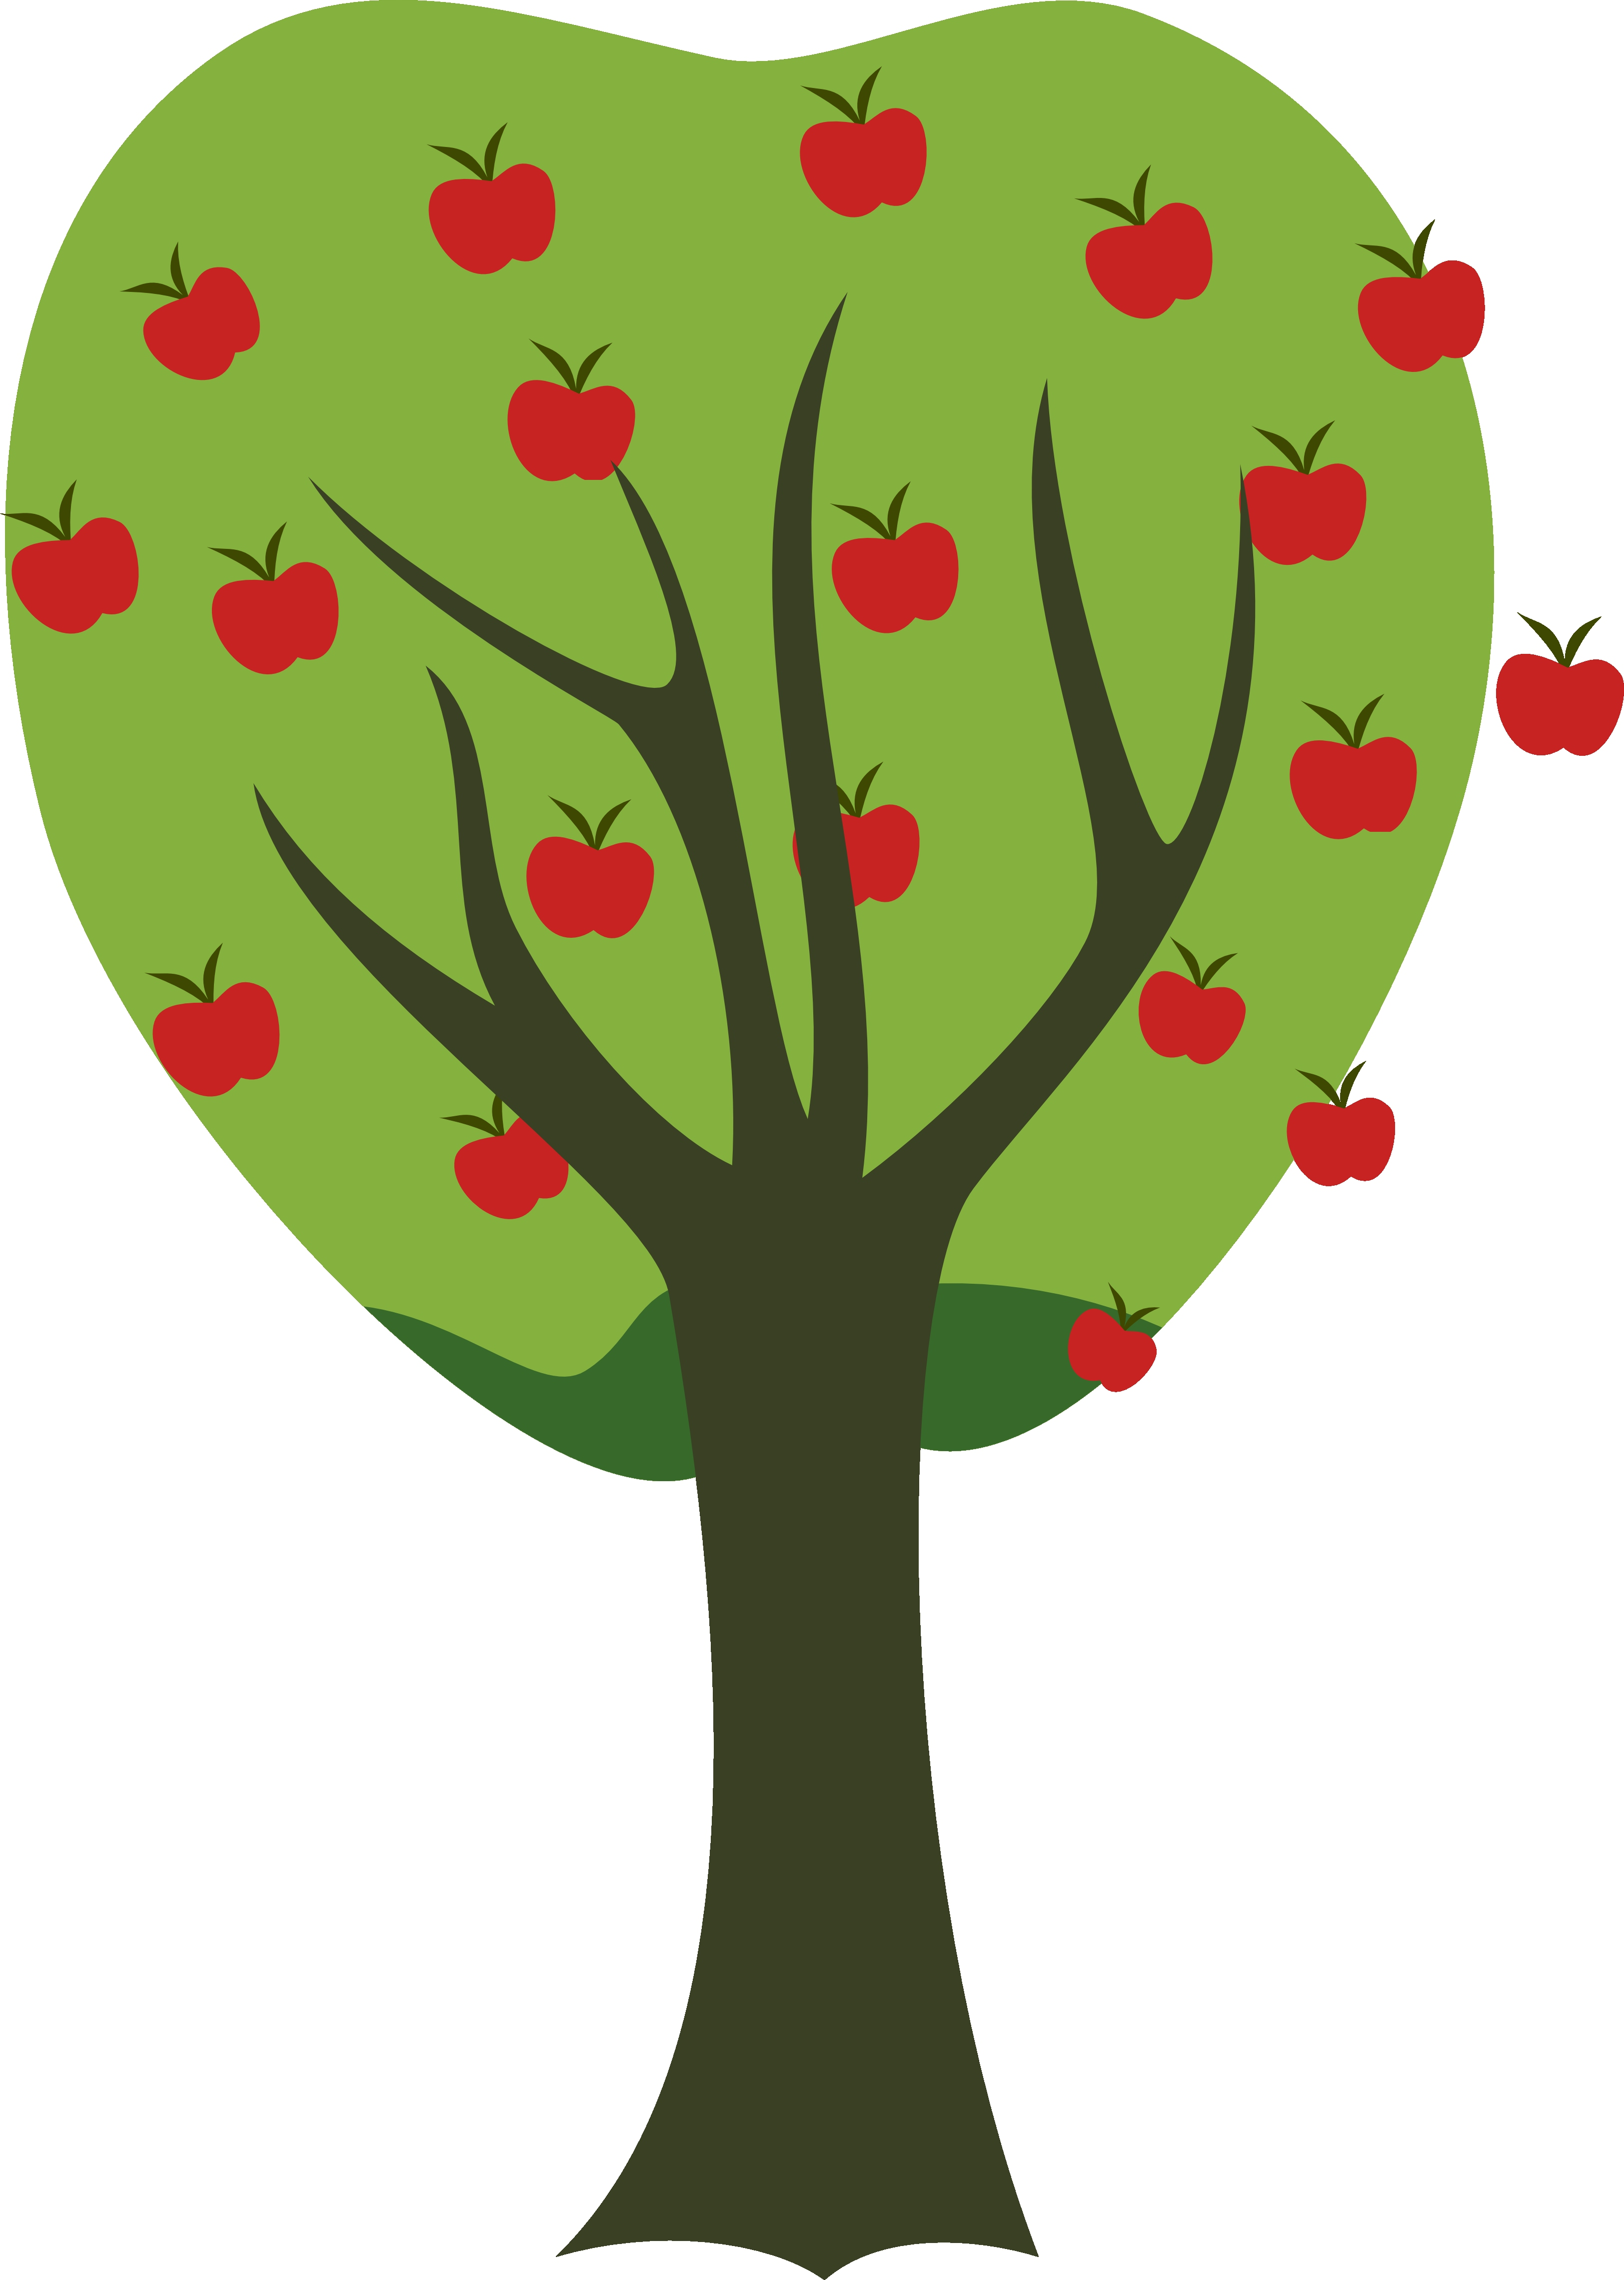 3249x4561 Apple Stem Clip Art Inspirational Apple Fruit Tree Clipart